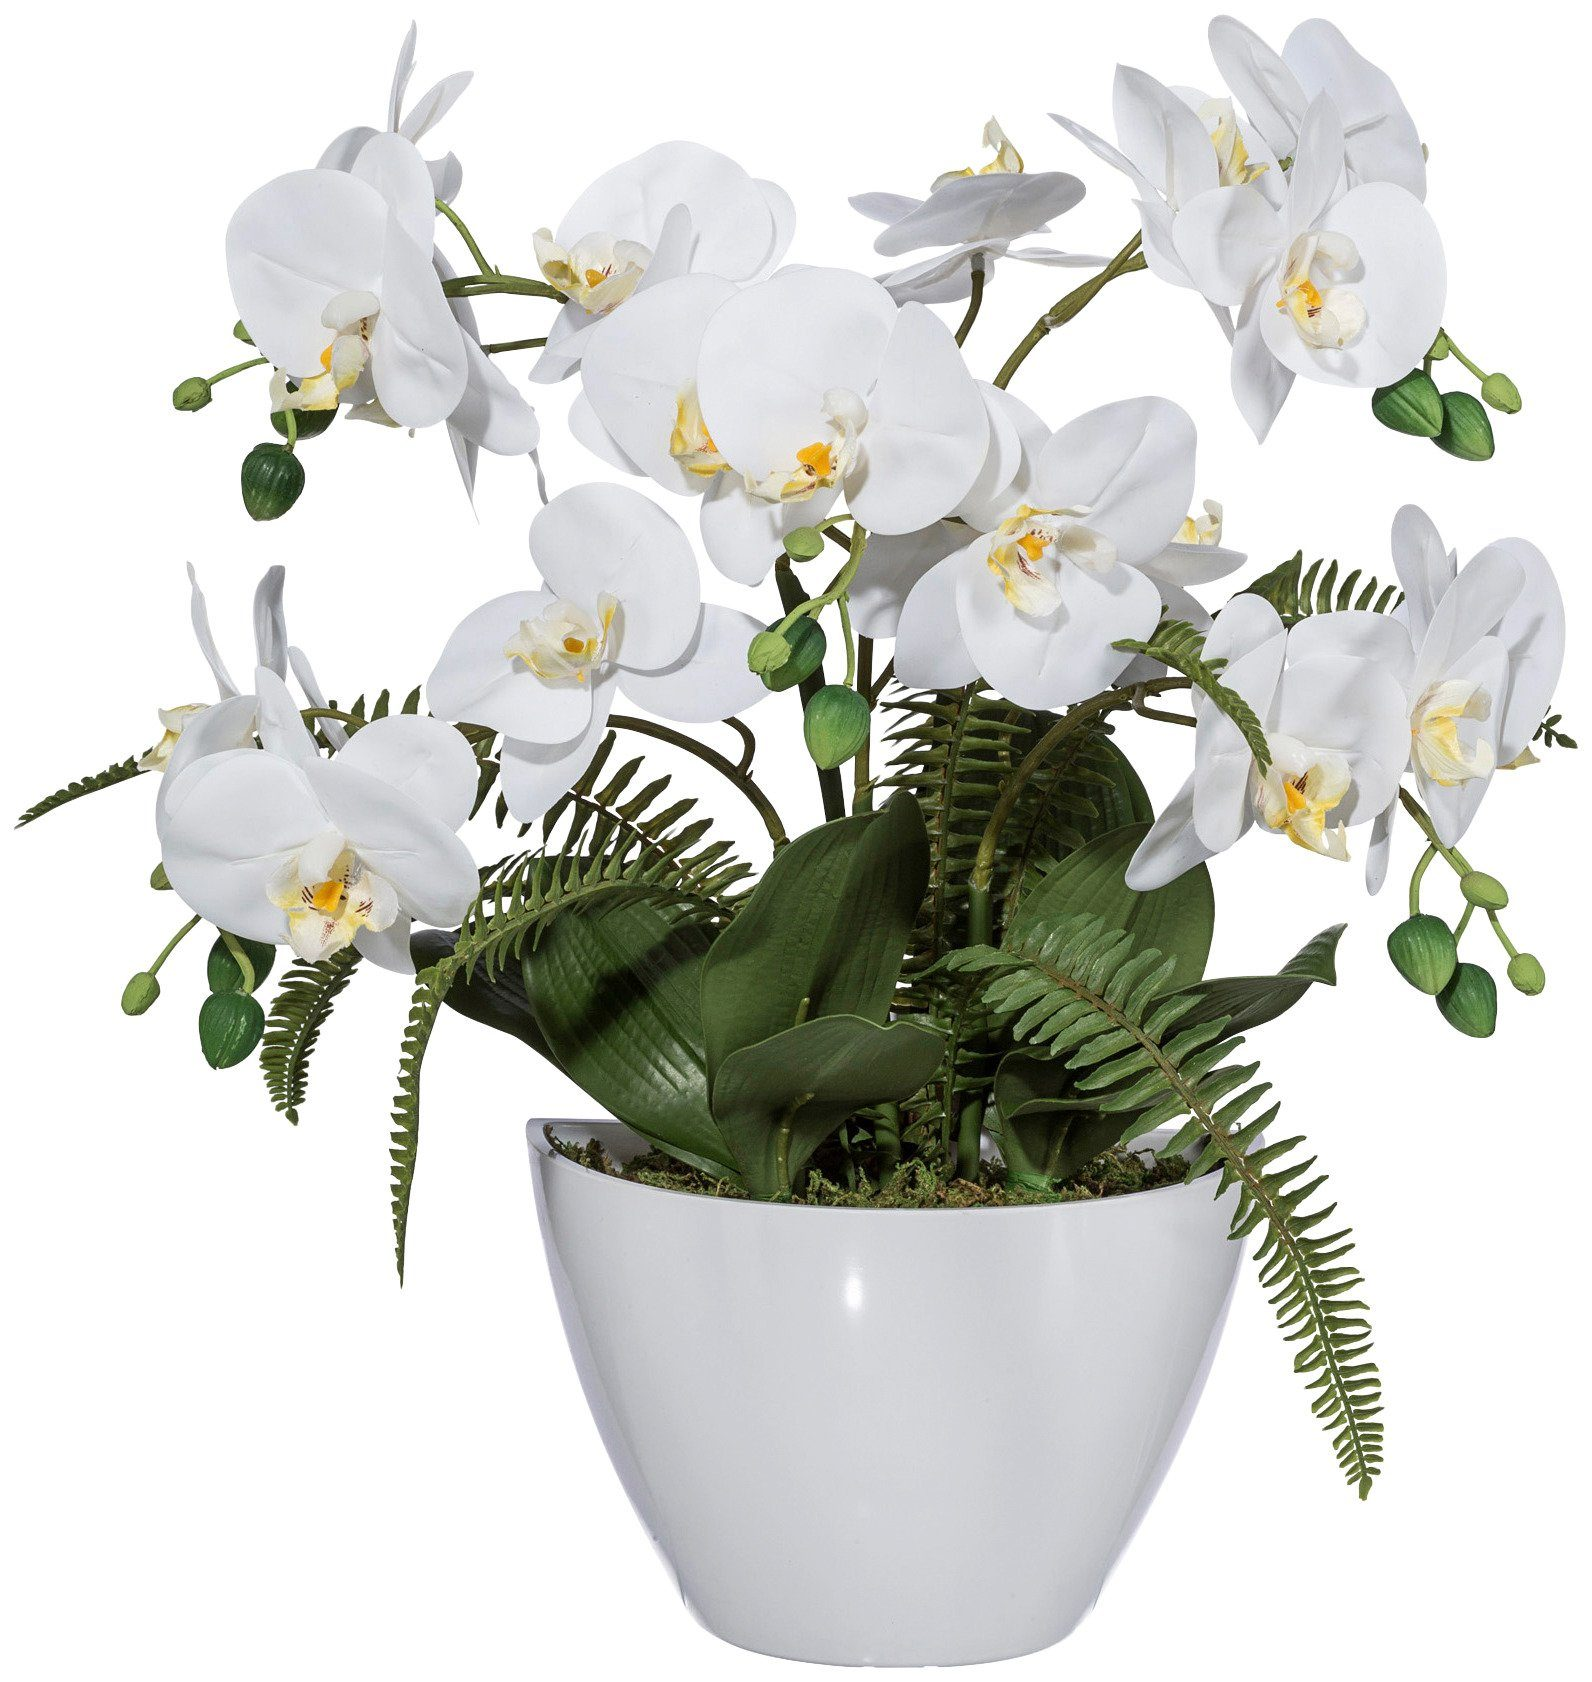 Kunstpflanze »Orchideengesteck« weiß inkl. Pflanzgefäß